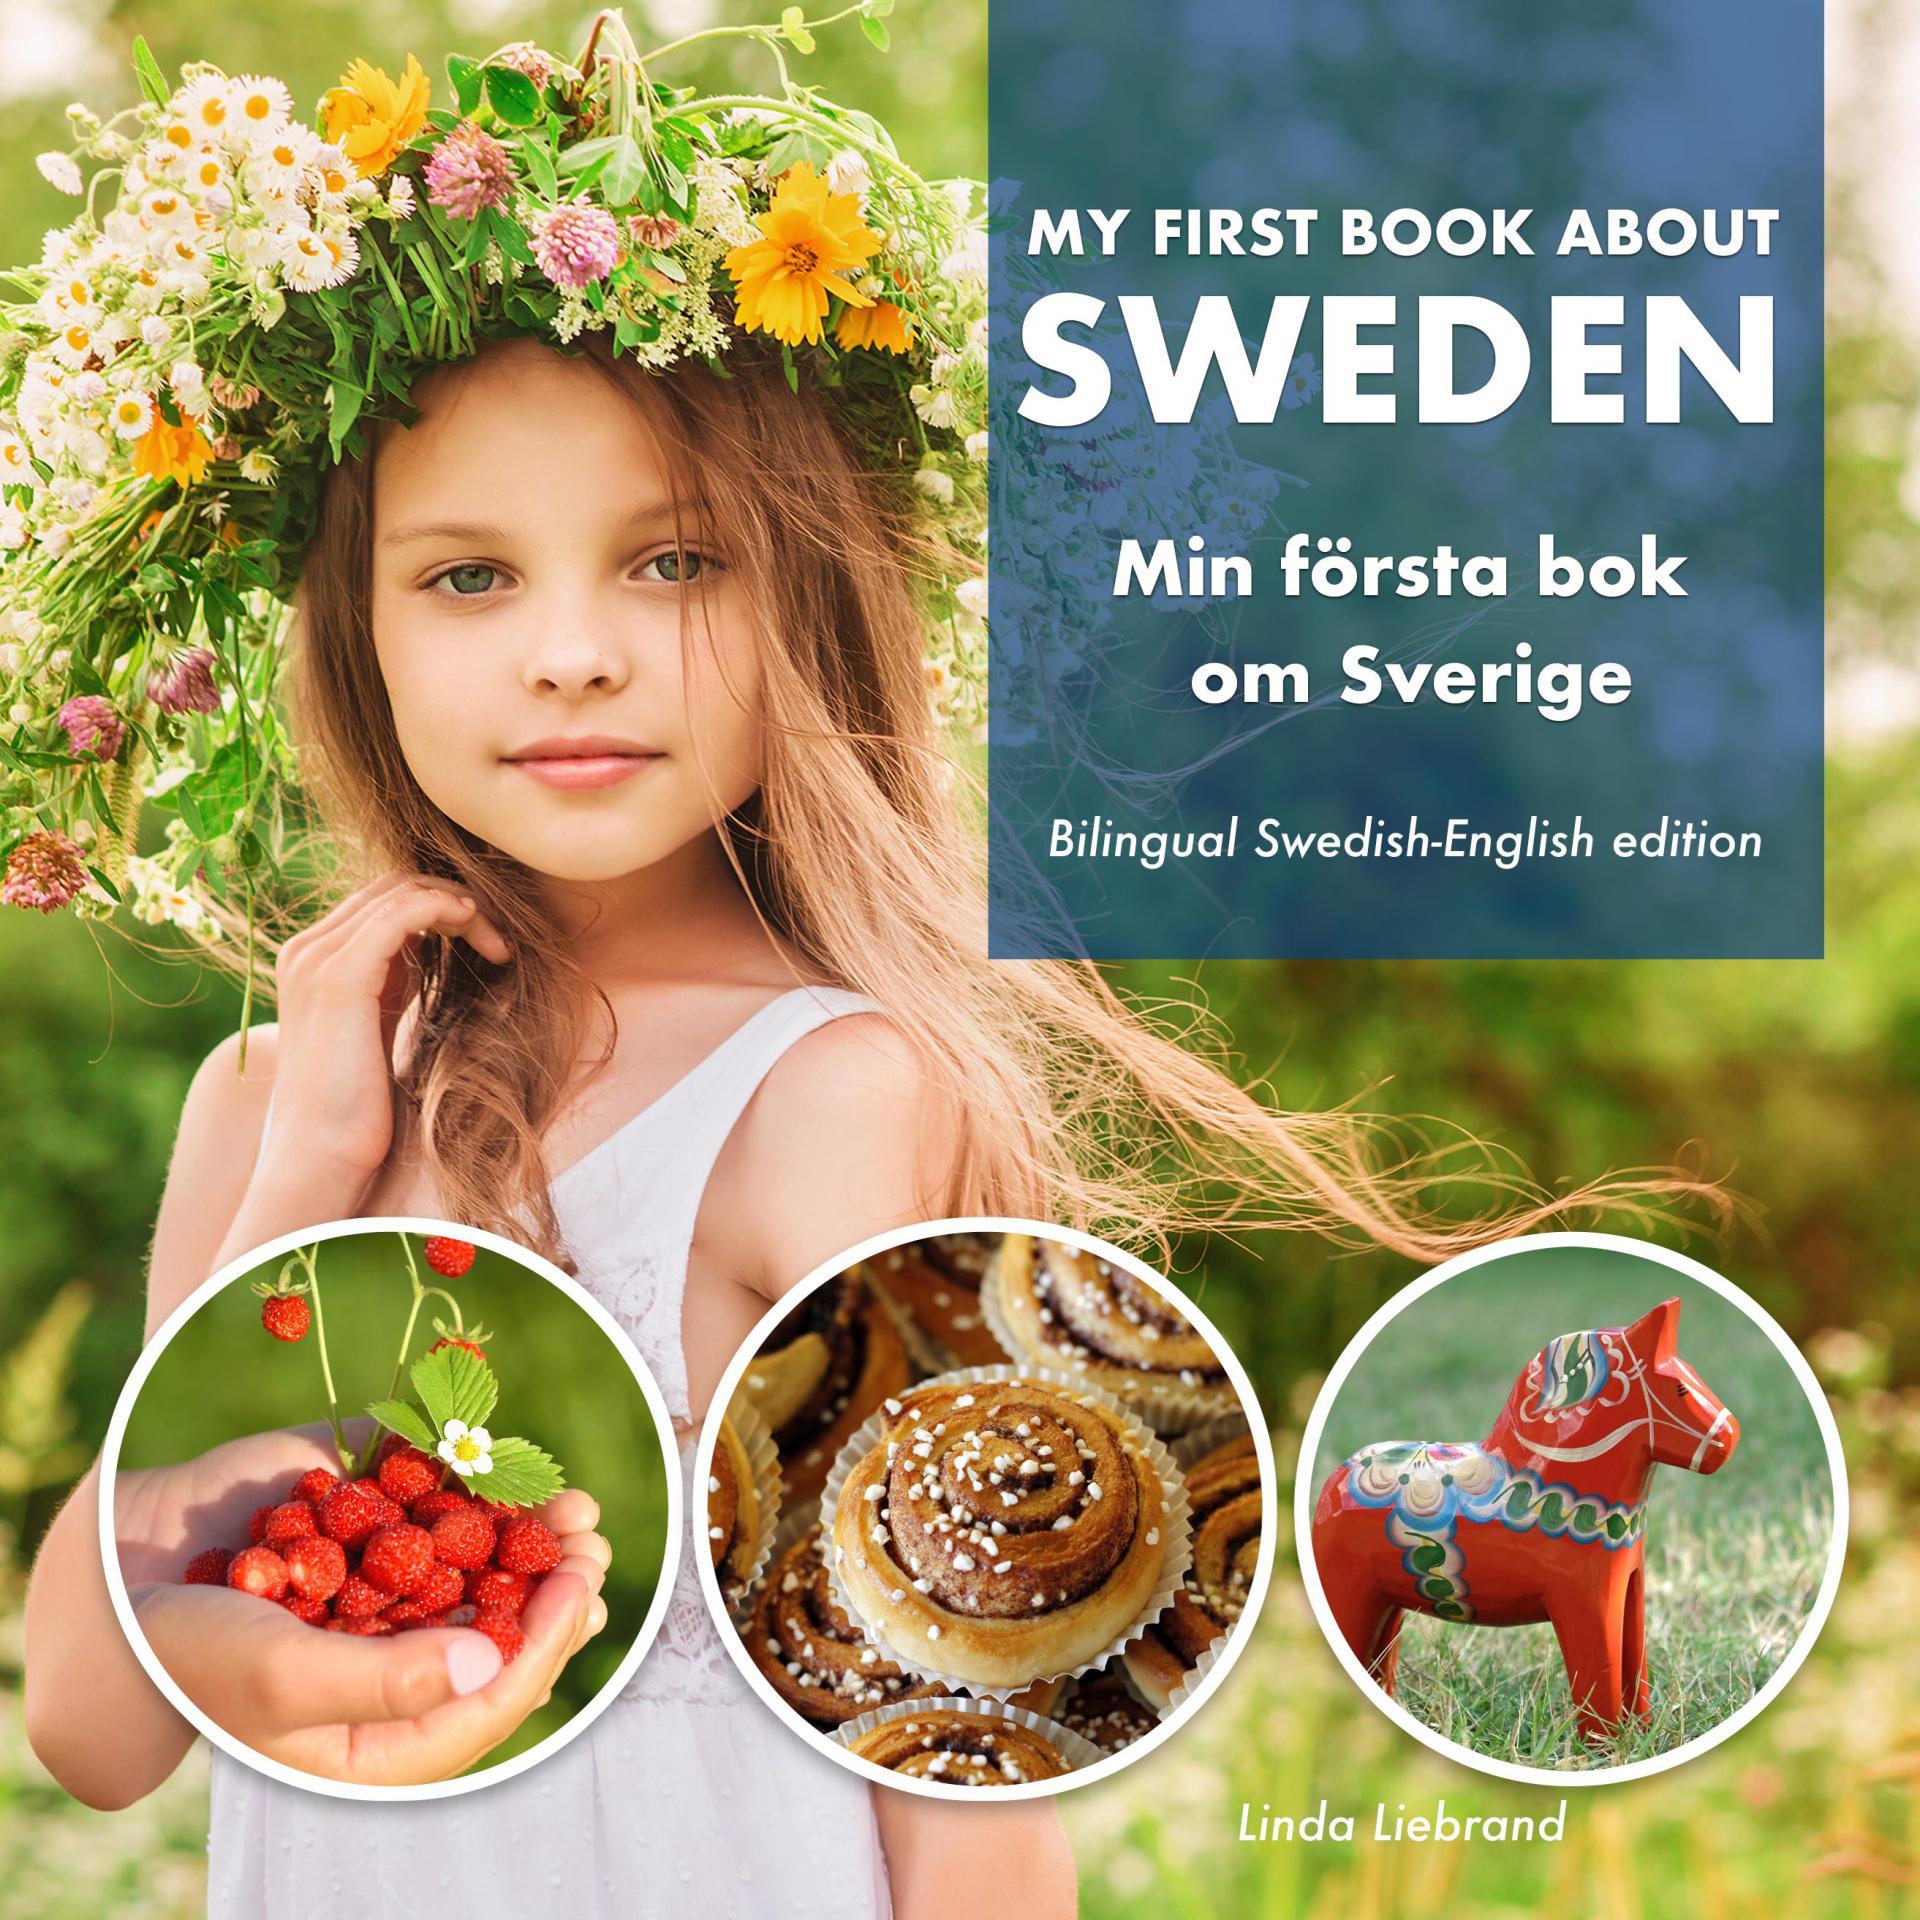 My first book about Sweden by Linda Liebrand ISBN: 978-1-9999854-4-8